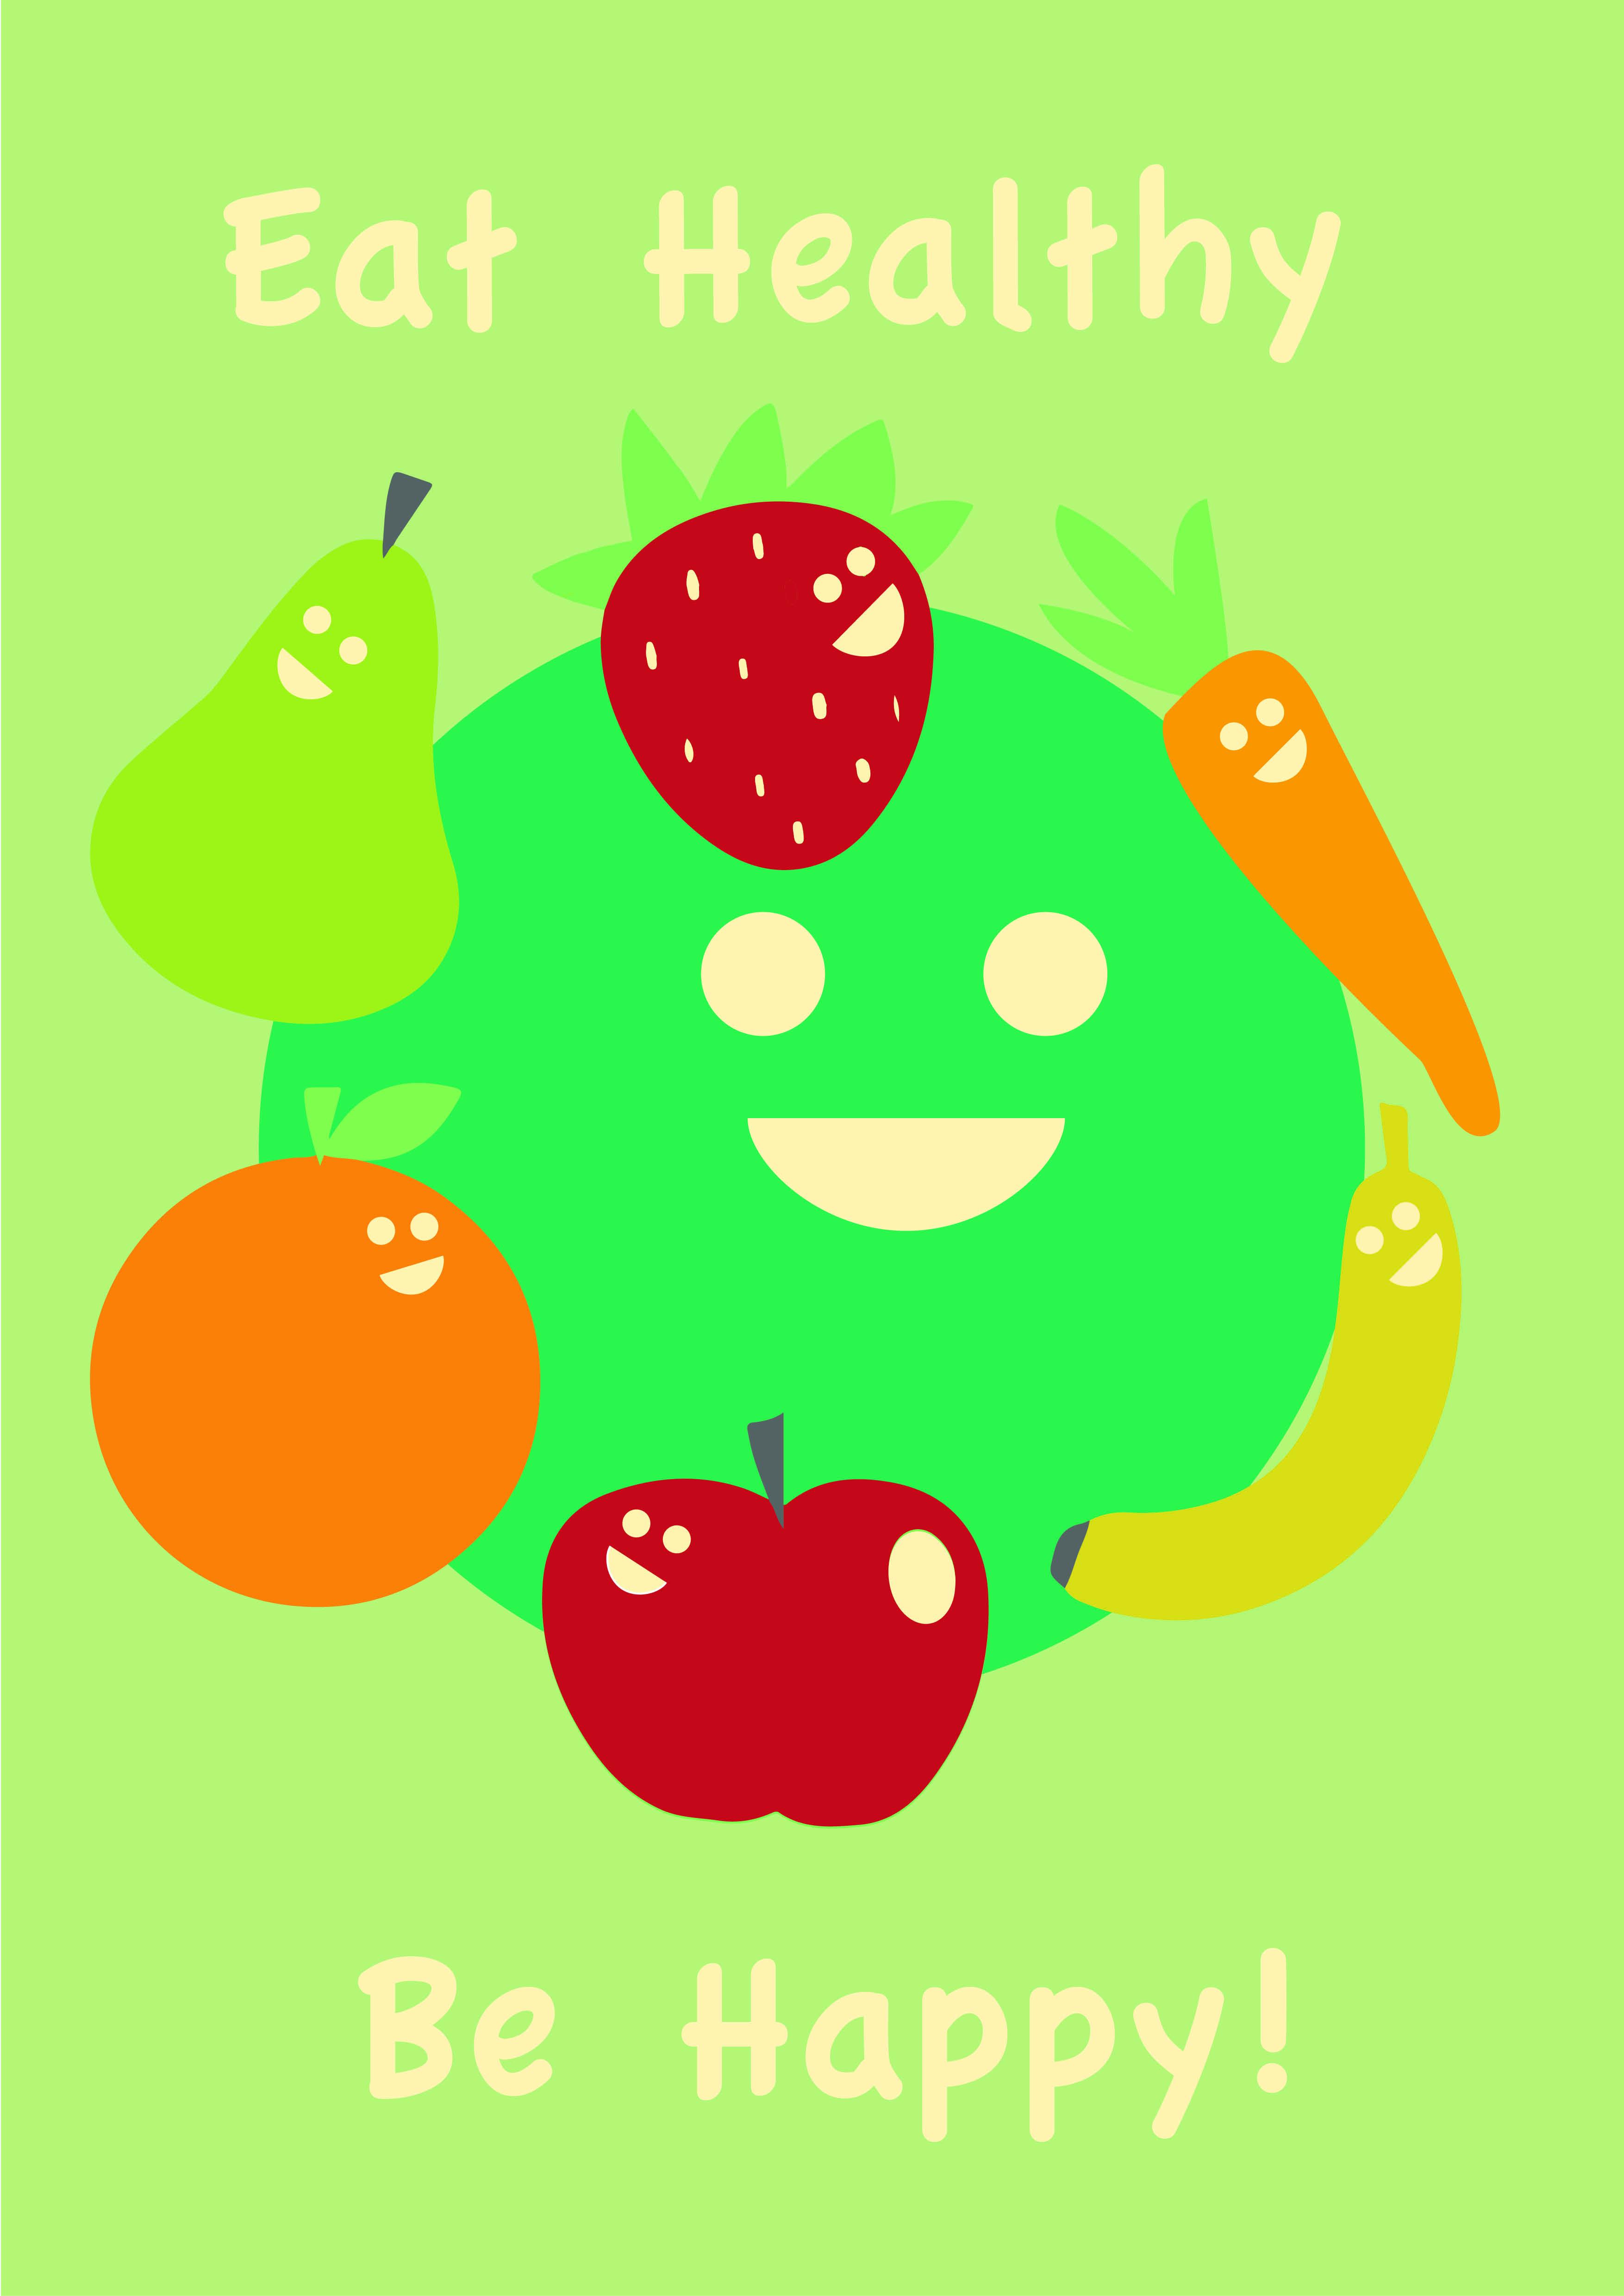 Simple Healthy Eating Poster Primary School